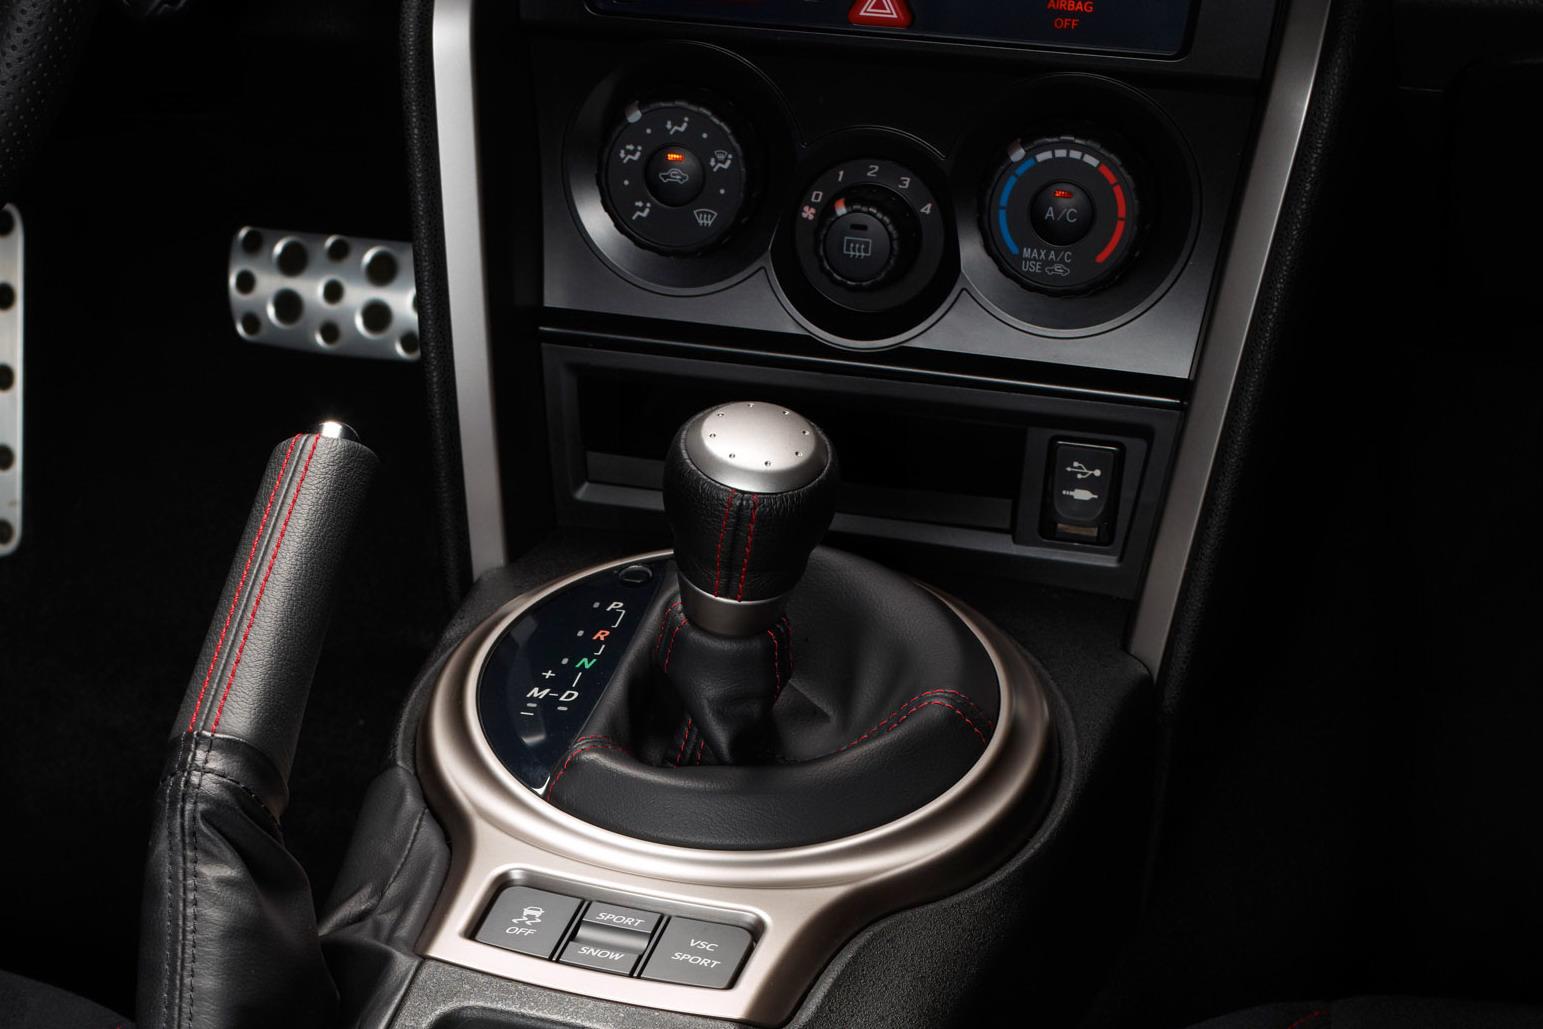 2013 scion fr s makes unveiled autoevolution rh autoevolution com 2013 scion fr s manual transmission fluid scion frs manual transmission for sale